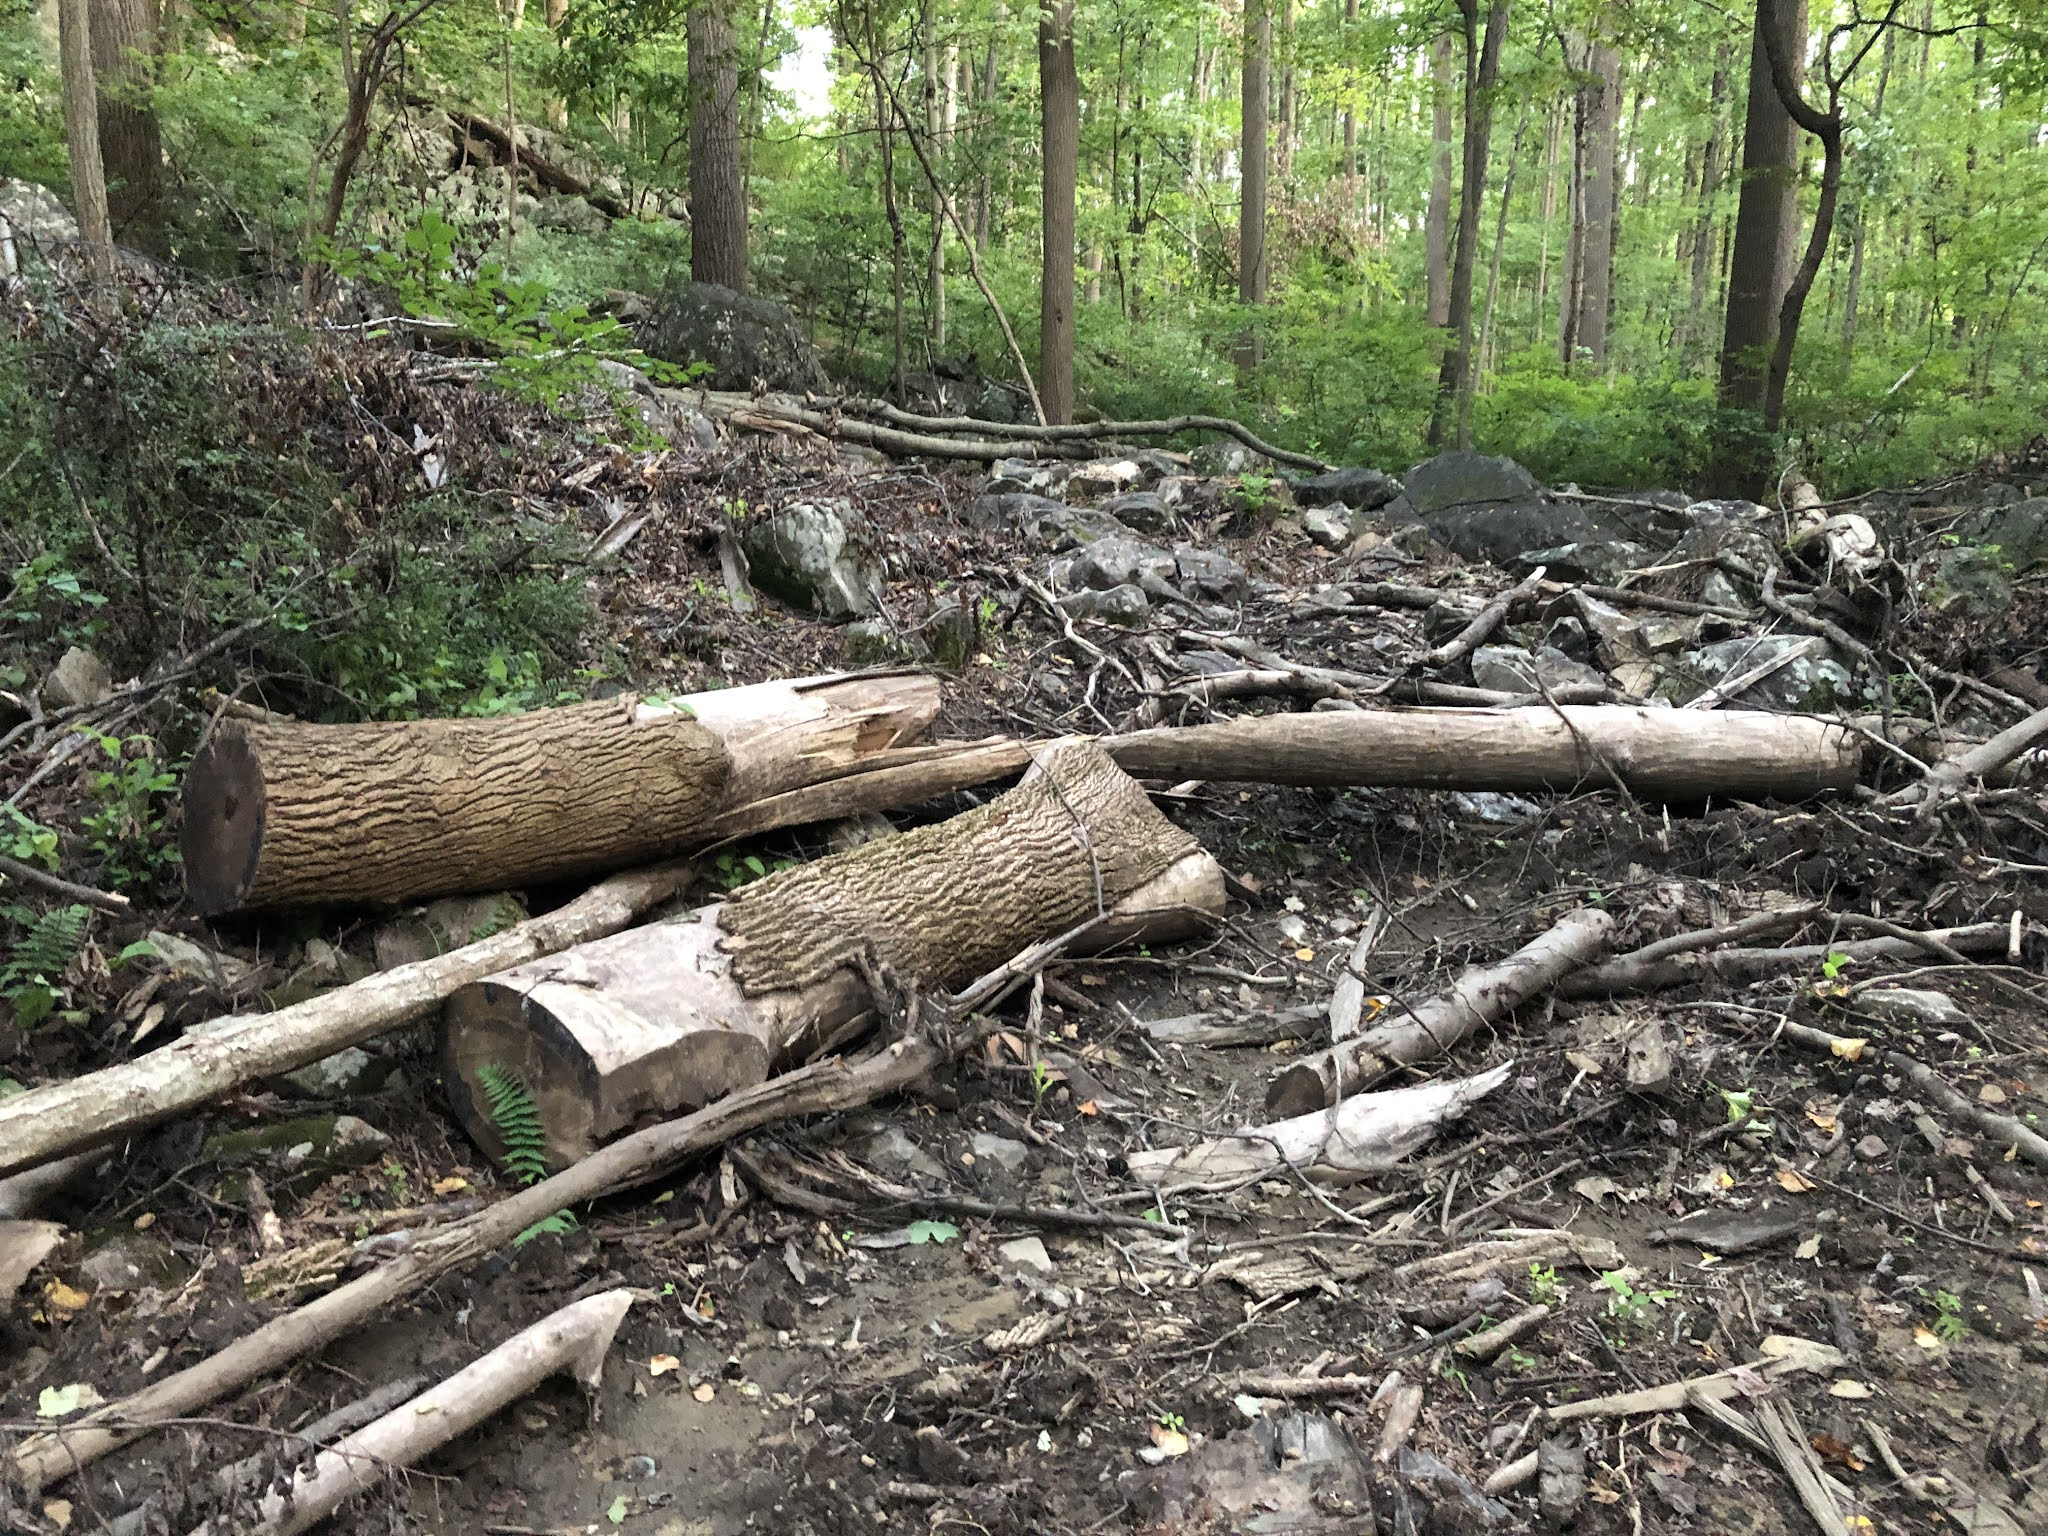 Hurricane Ida's impact on Roaring Rock Park's June 2021 logging sites